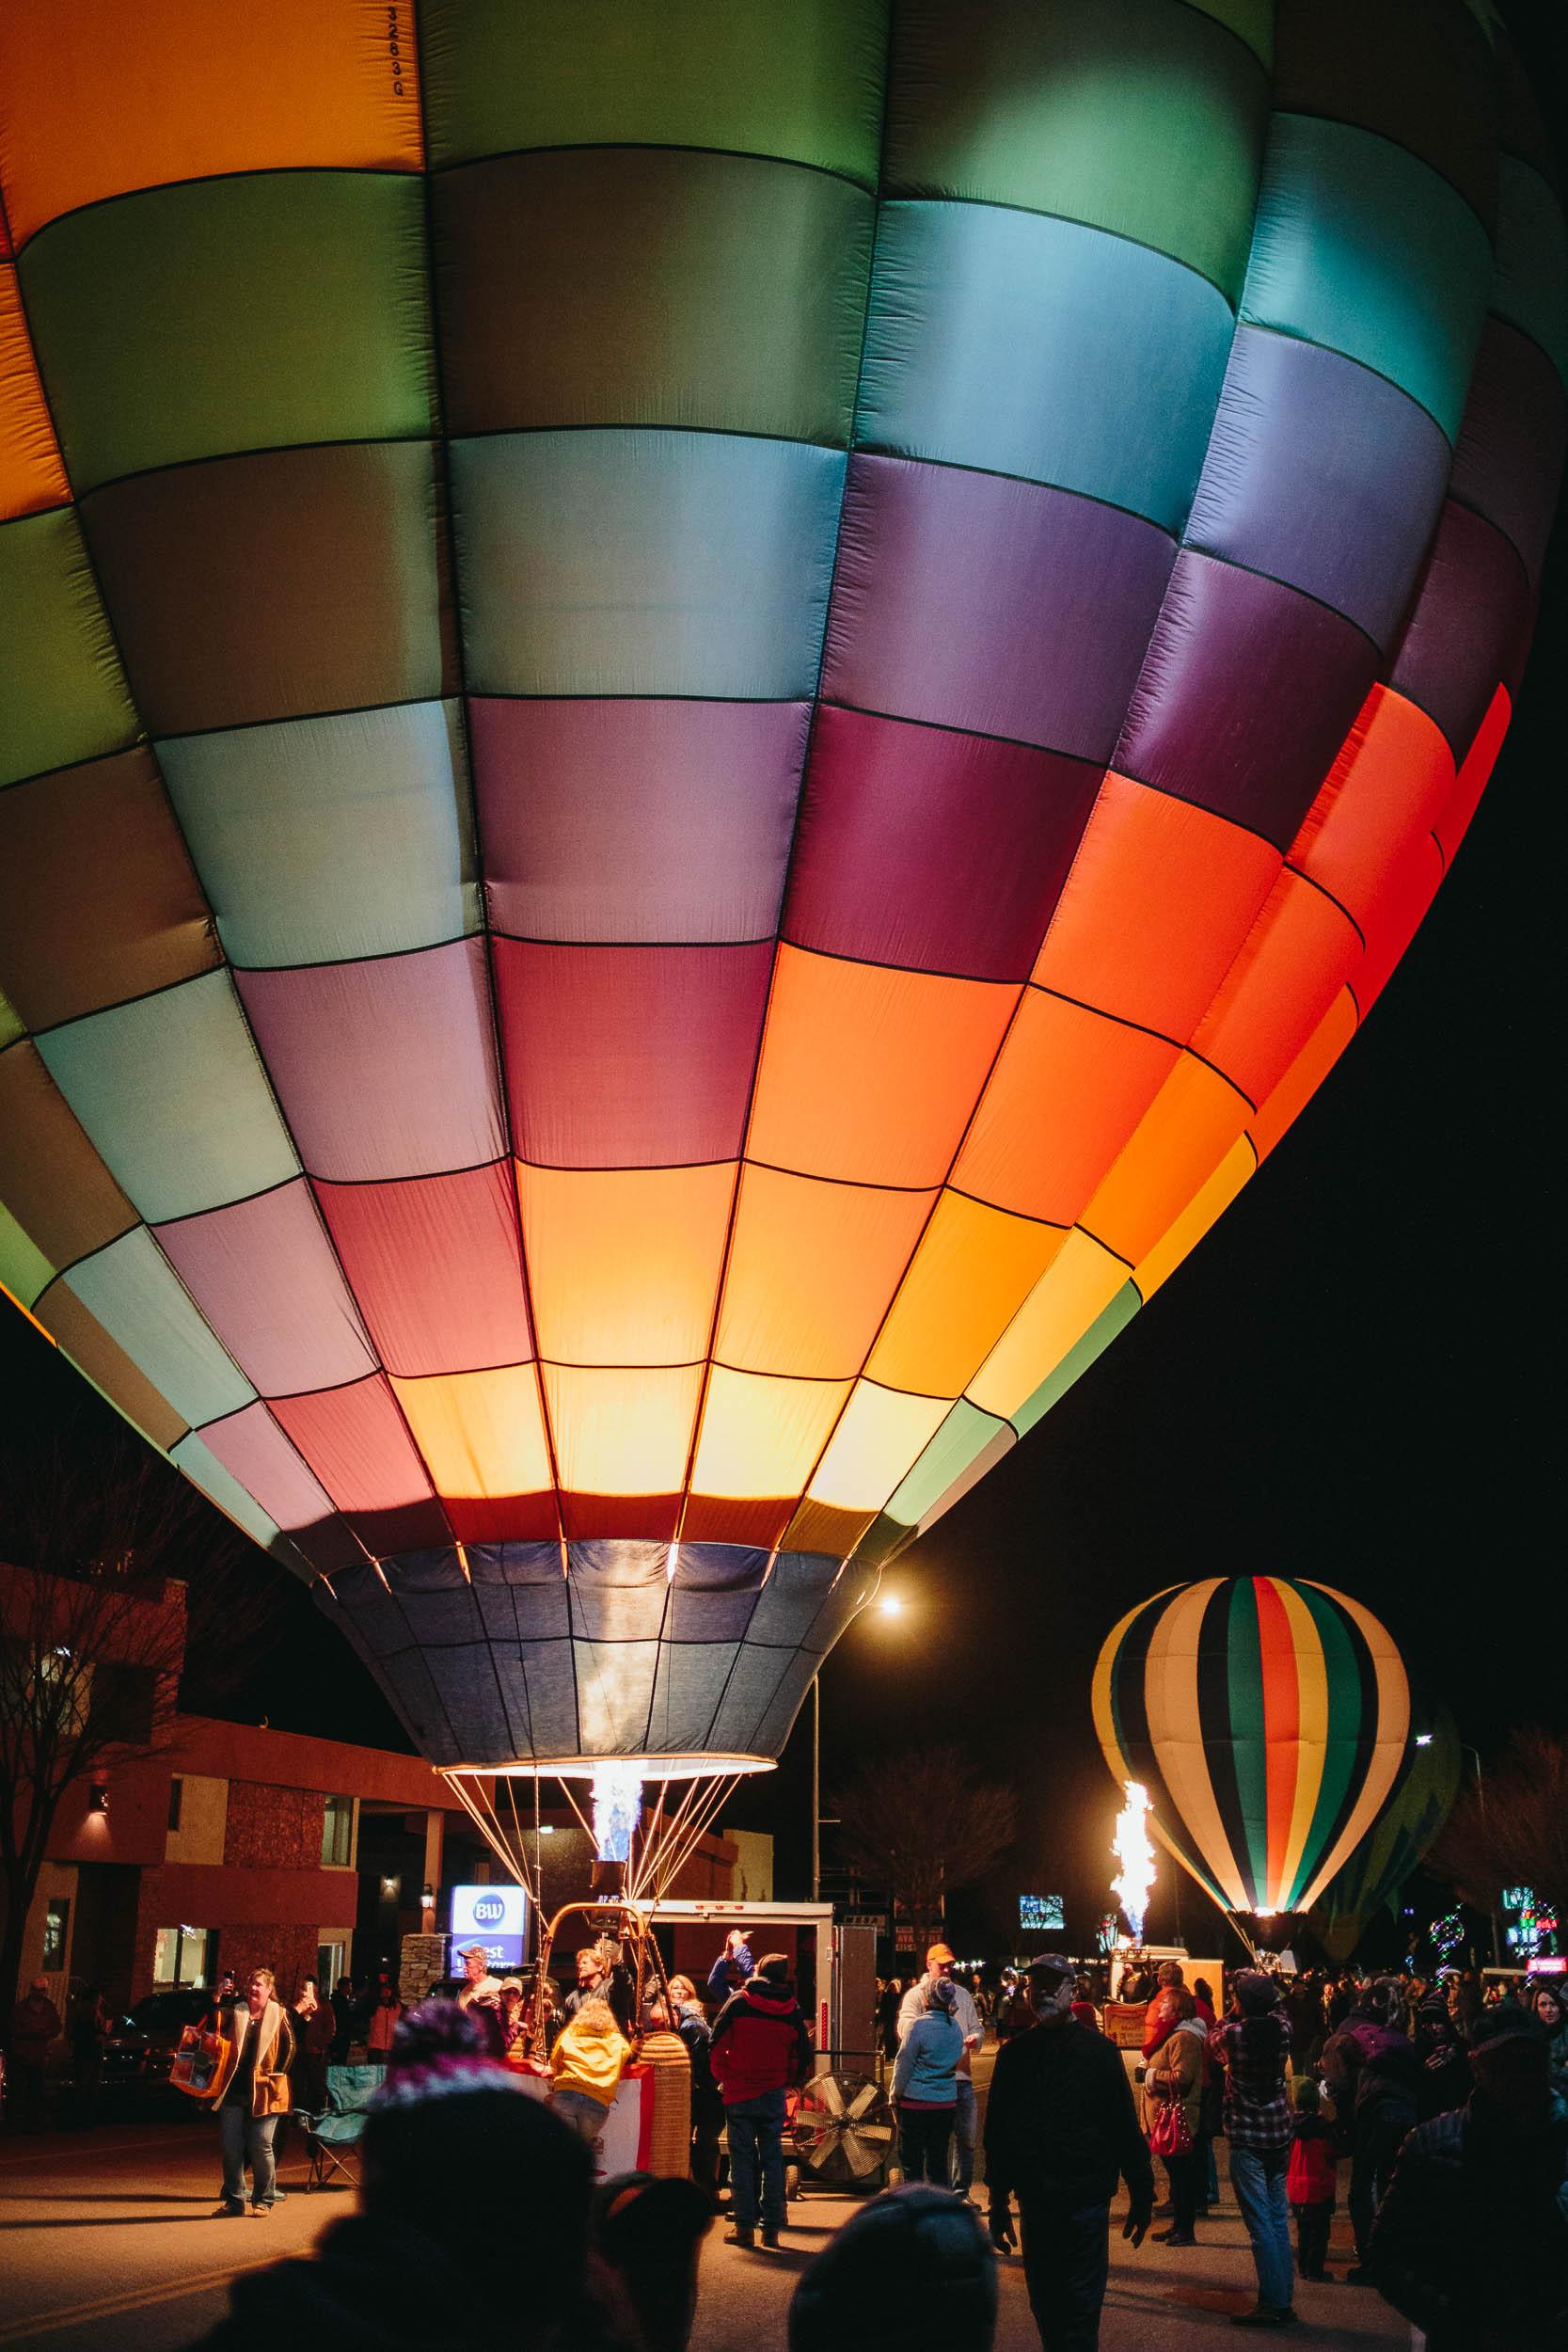 Kyle-Sheppard-Kanab-Balloon-Festival-51.jpg